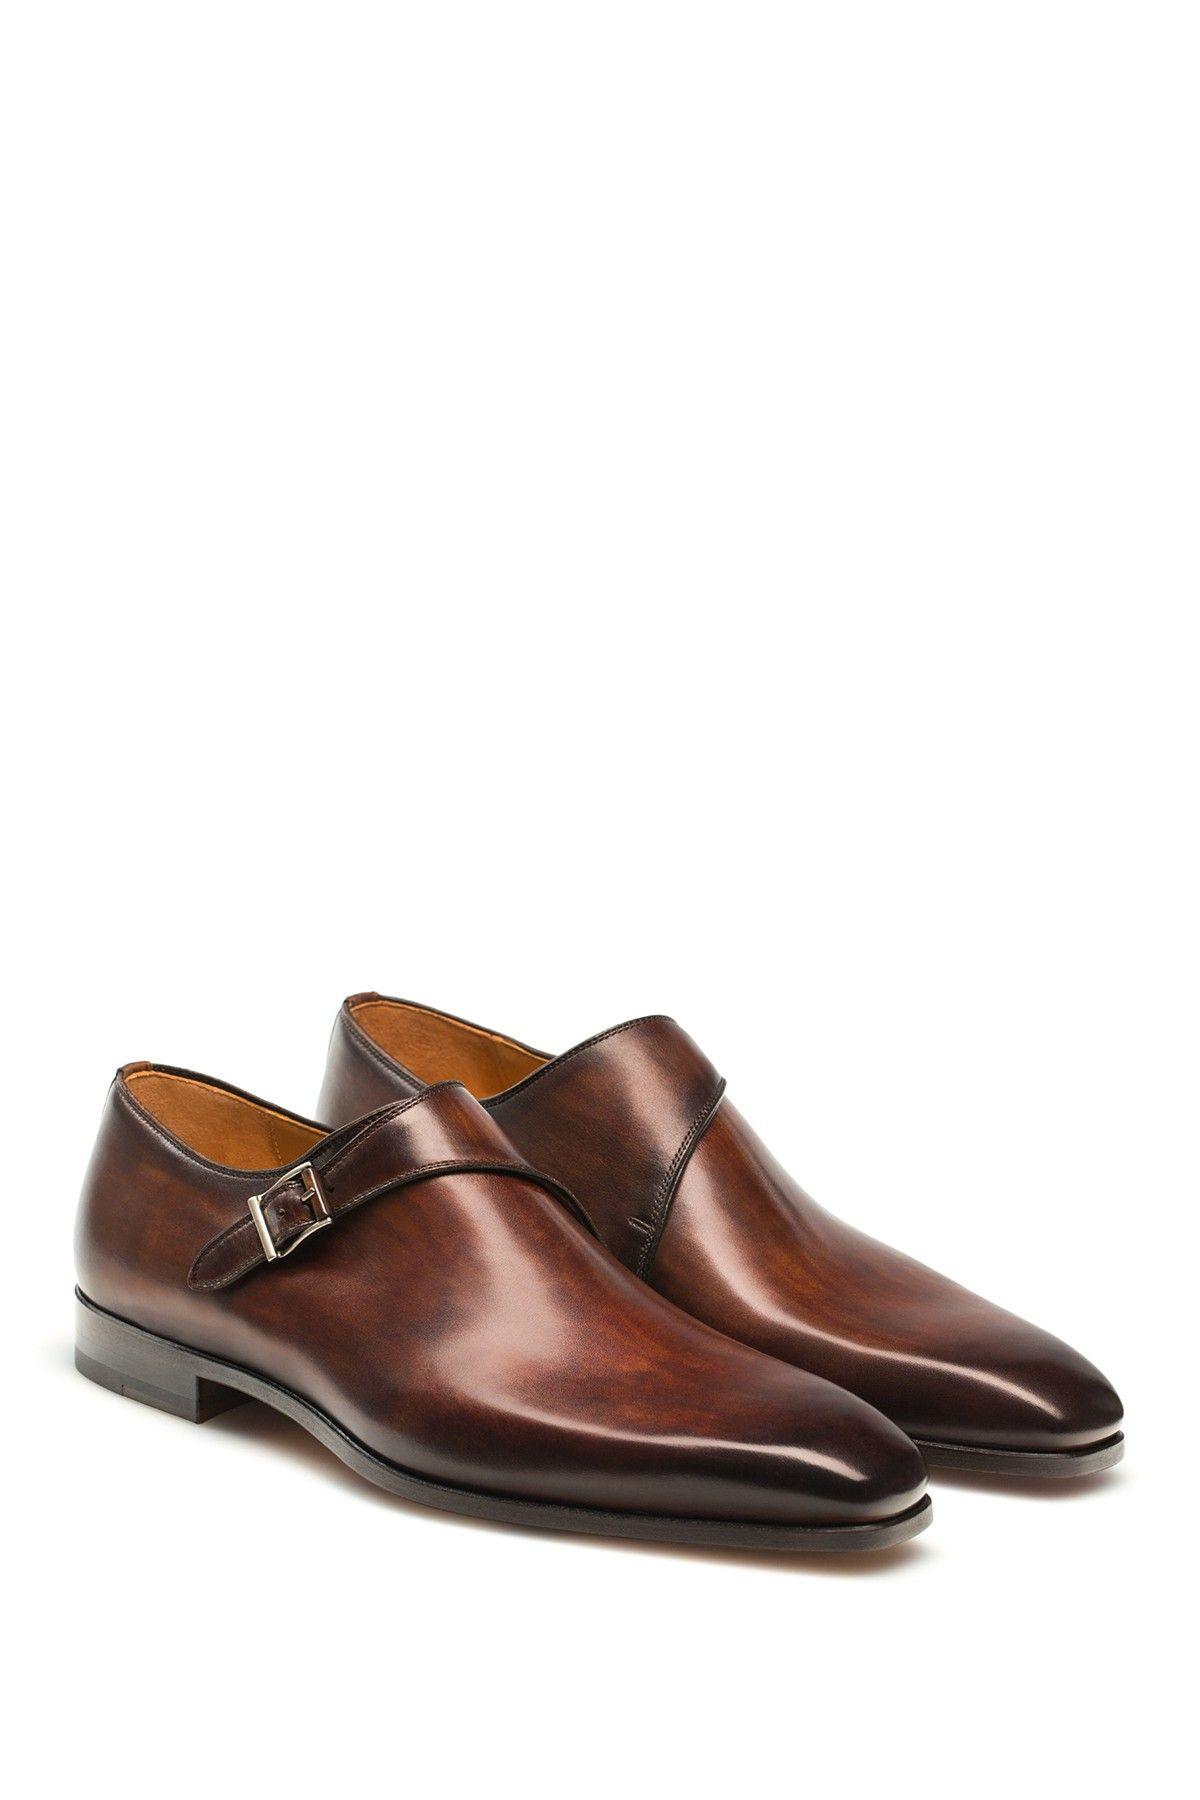 MagnanniMen's Saburo Monk Strap Shoe 0ljSdMe